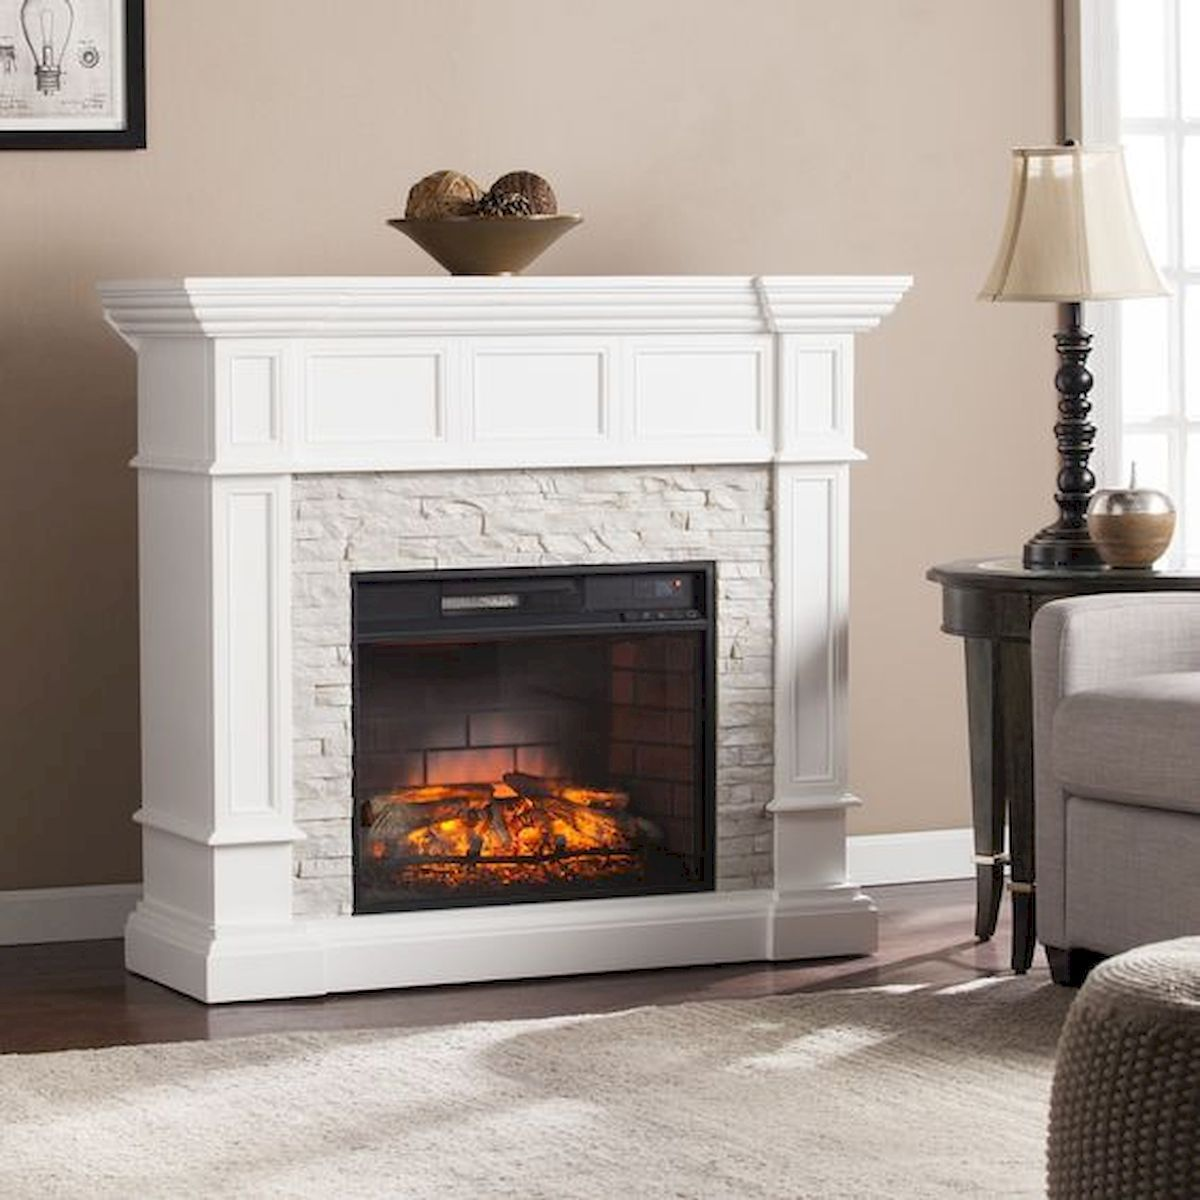 Brilliant 33 Gorgeous Farmhouse Fireplace Decor Ideas And Design 33 Interior Design Ideas Inesswwsoteloinfo